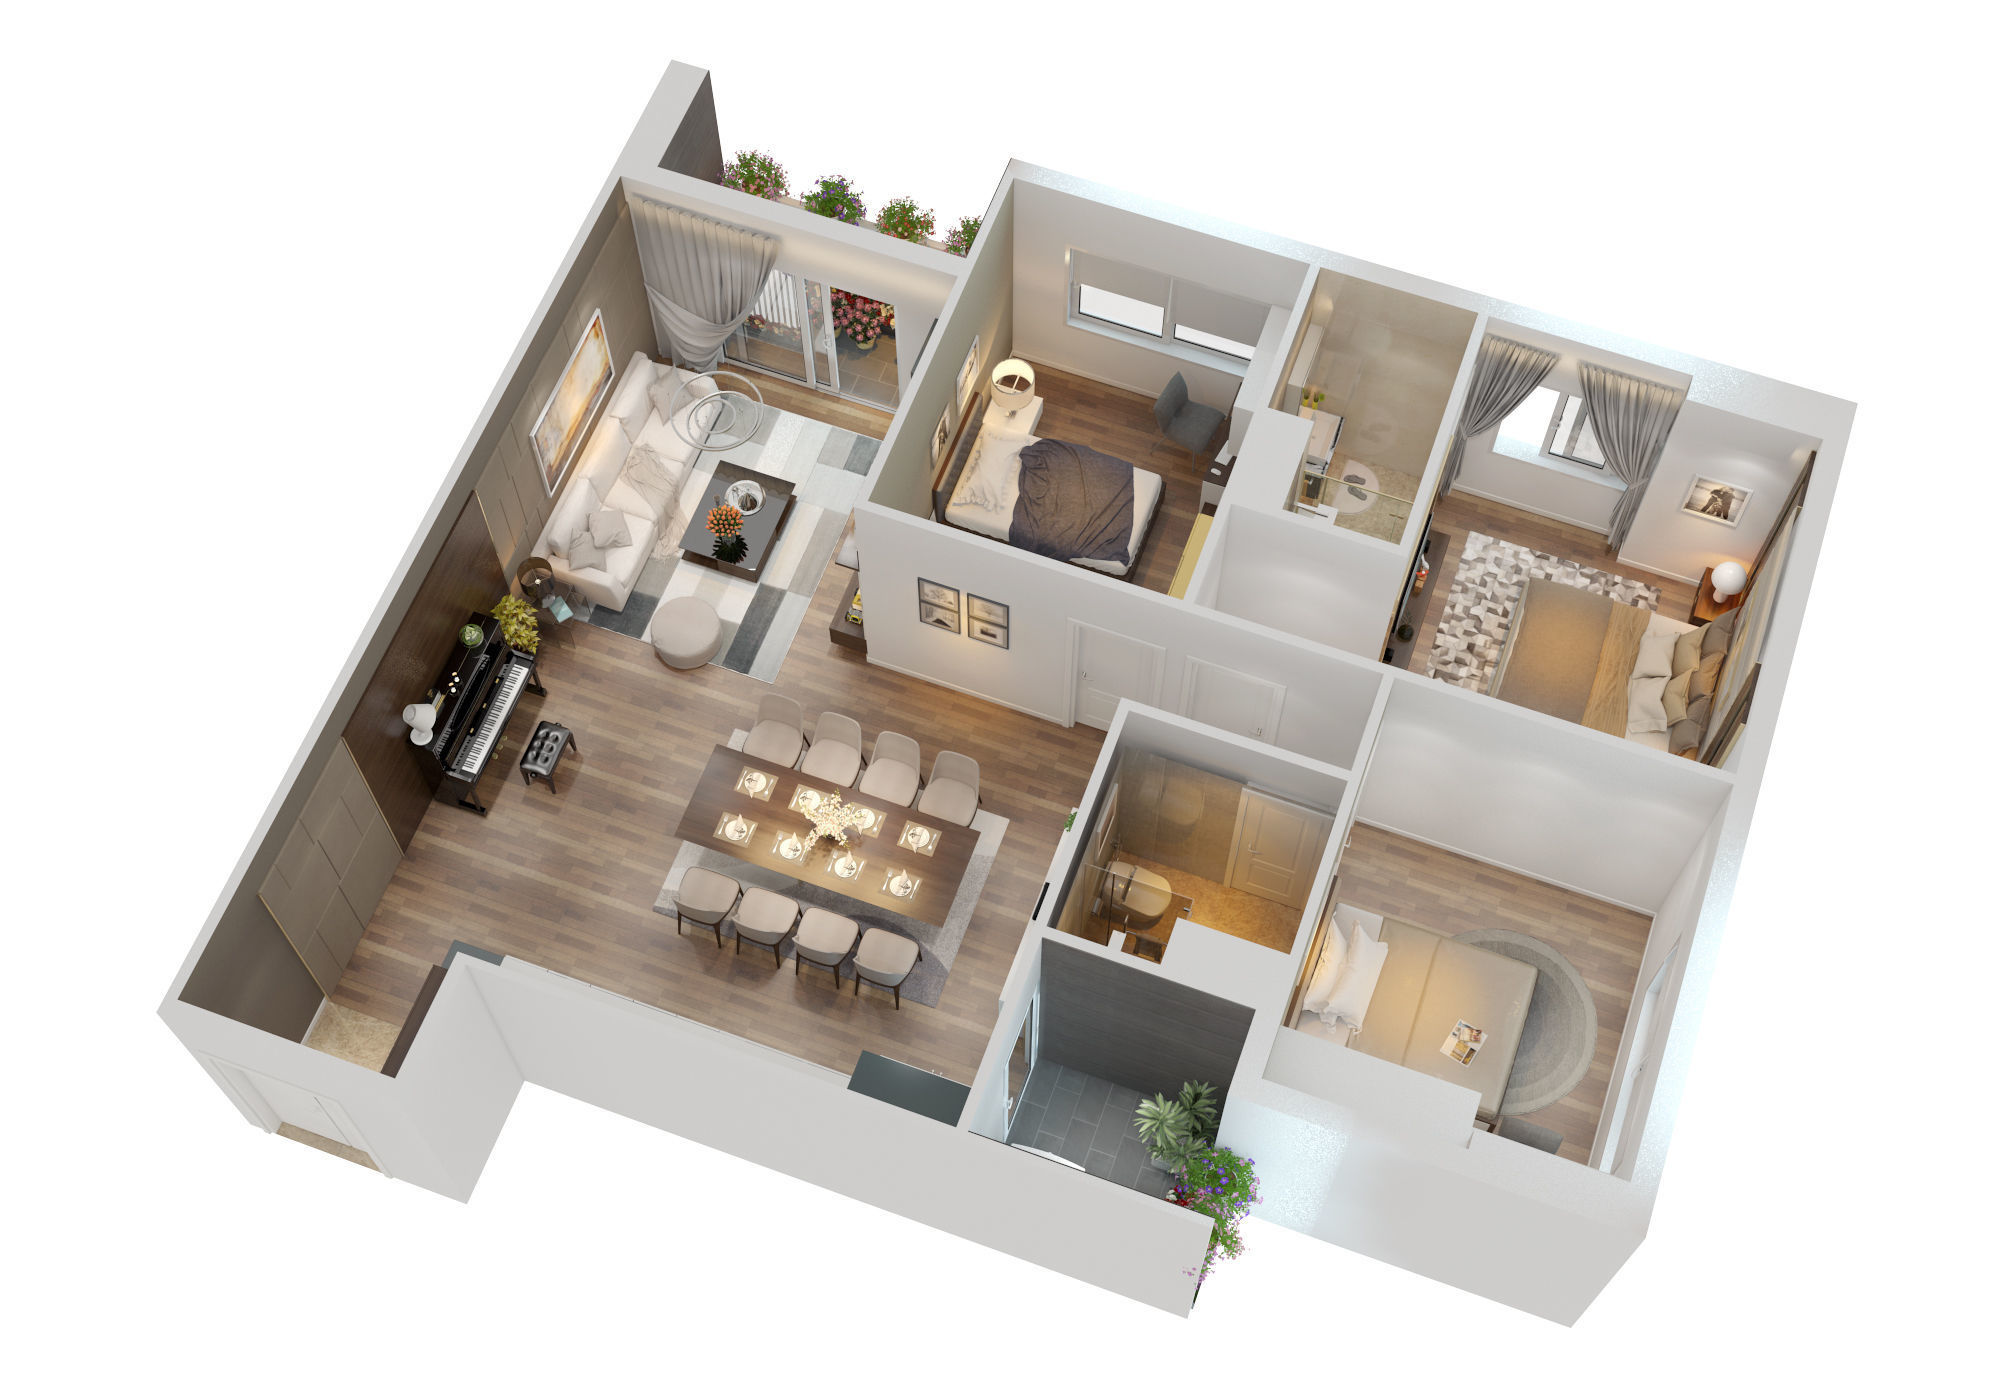 Cutaway Apartment Full Furnitures Modern Design: Dining 3D CUTAWAY MODERN APARTMENT FULL FURNITURES